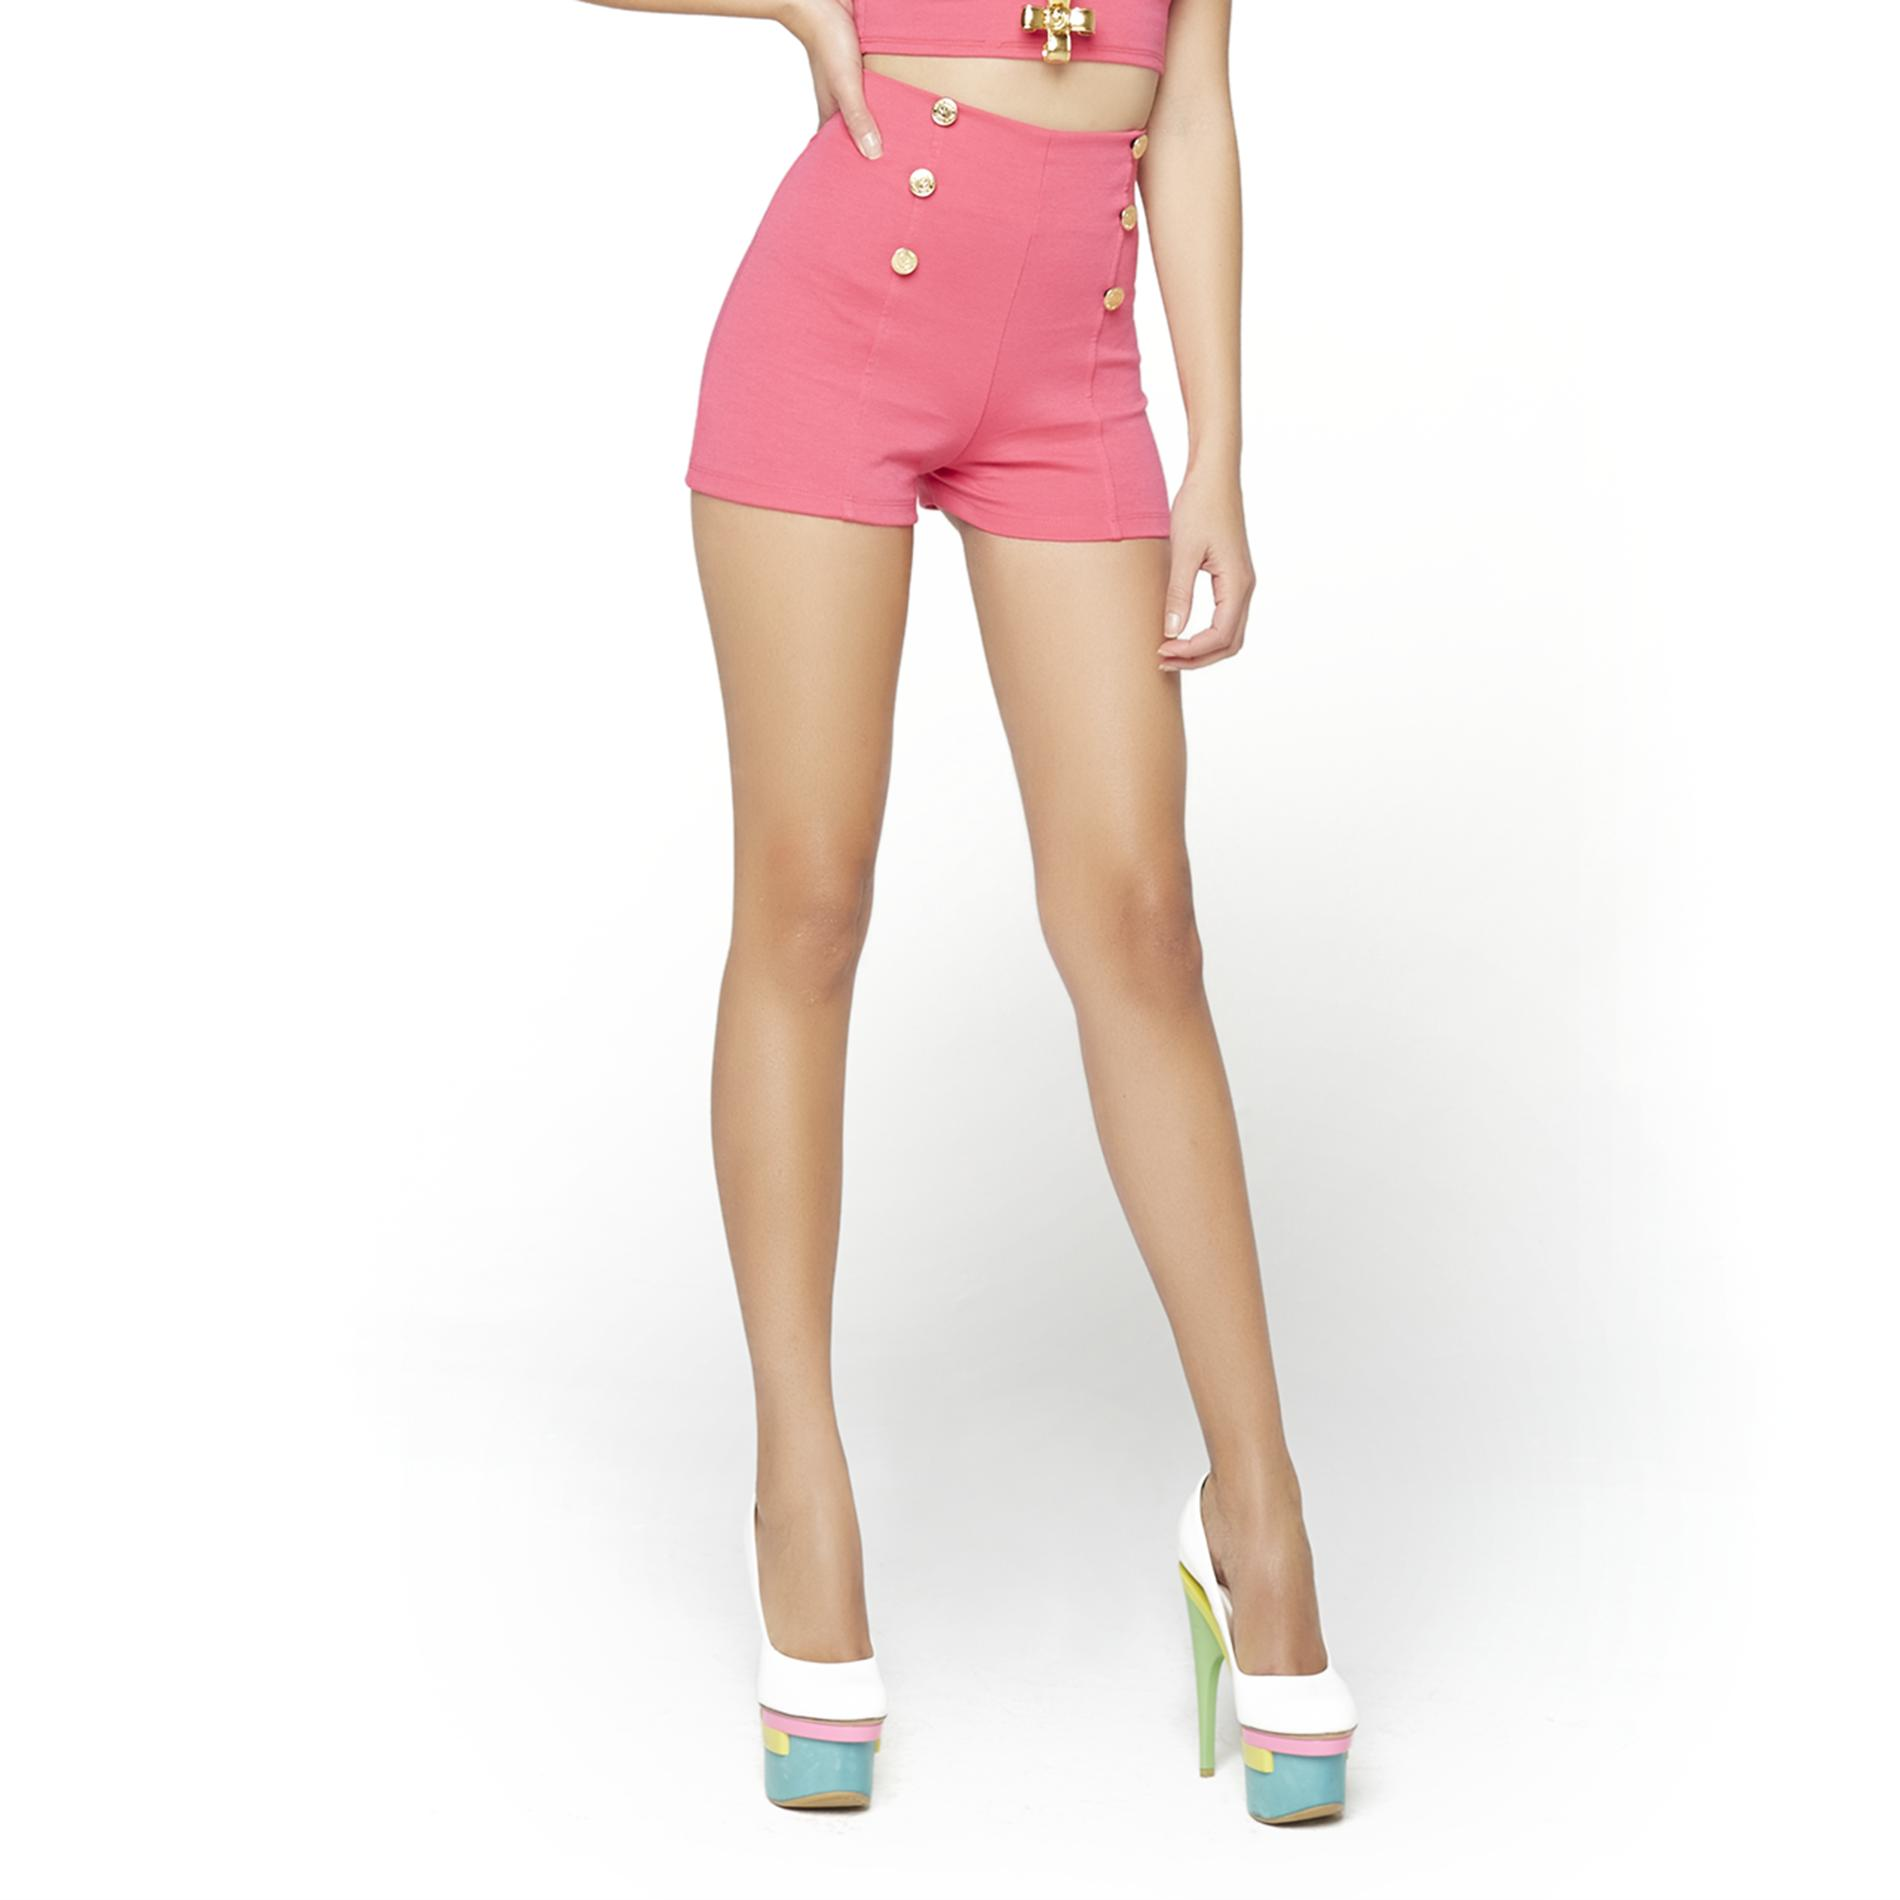 Nicki Minaj Women's Sailor Shorts at Kmart.com